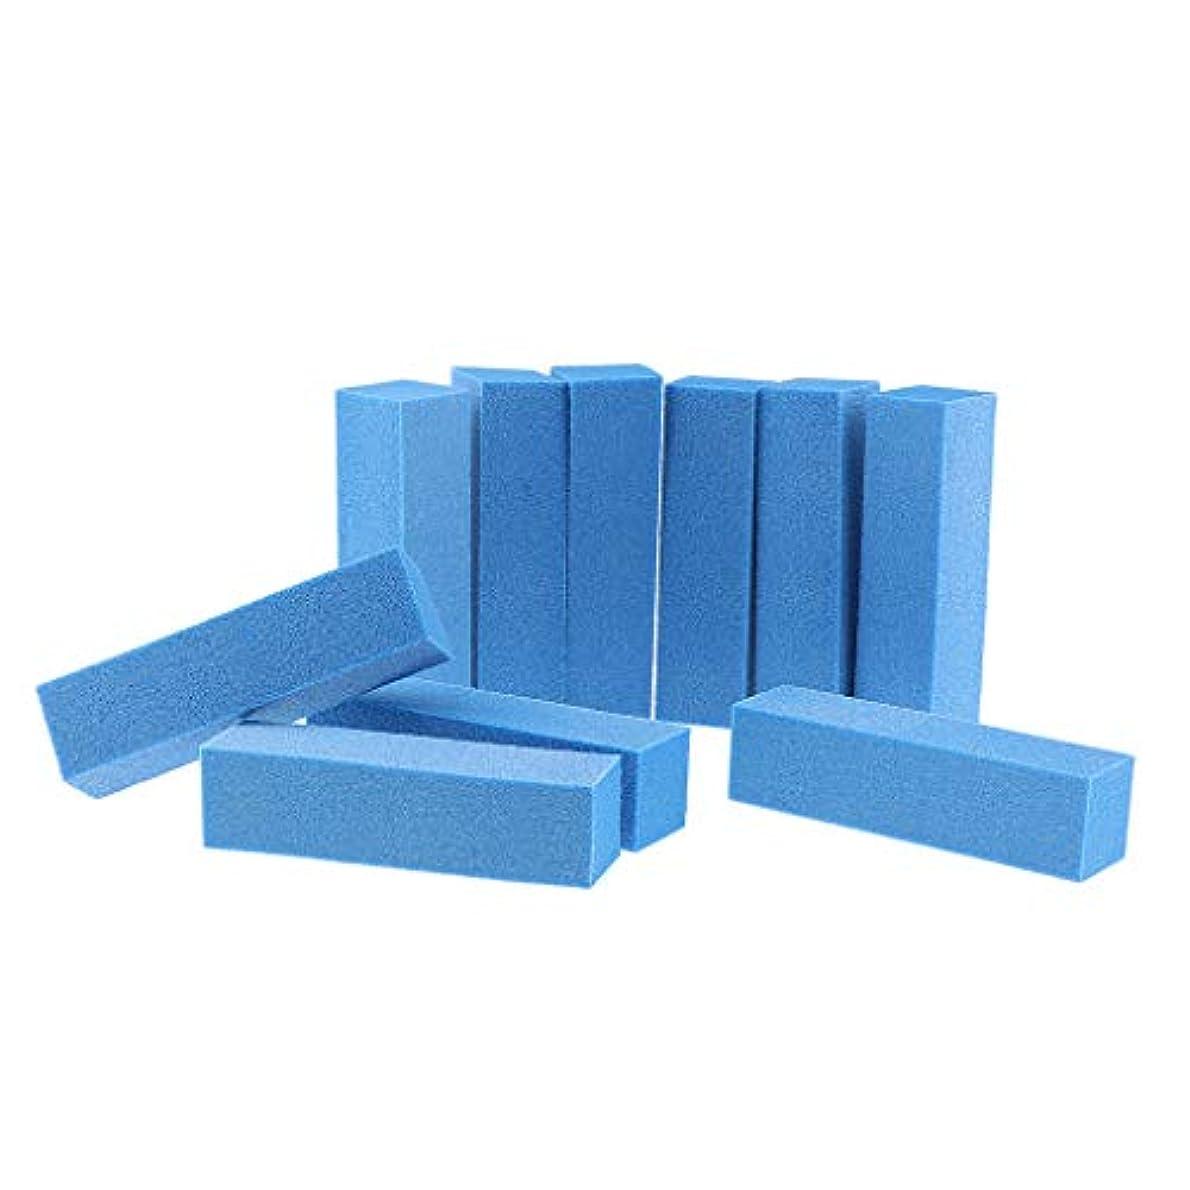 Toygogo 10PCSネイルアートケアバッファーバフ研磨サンディングブロックファイルグリットアクリルマニキュアツール-プロフェッショナルサロン使用または家庭用